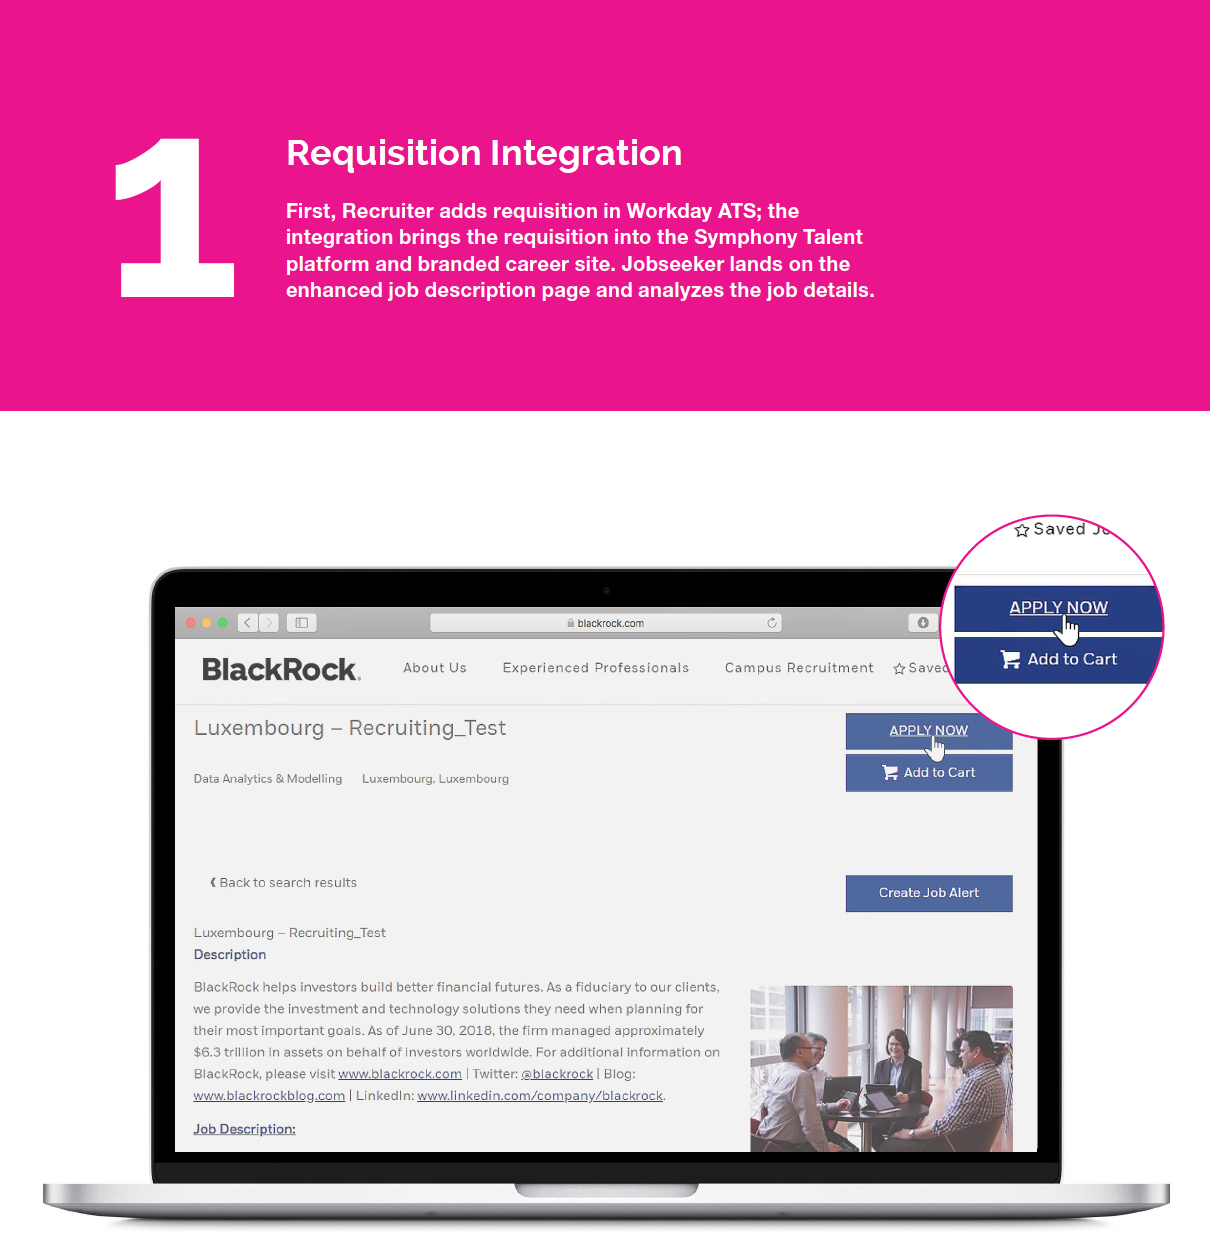 Requisition Integration